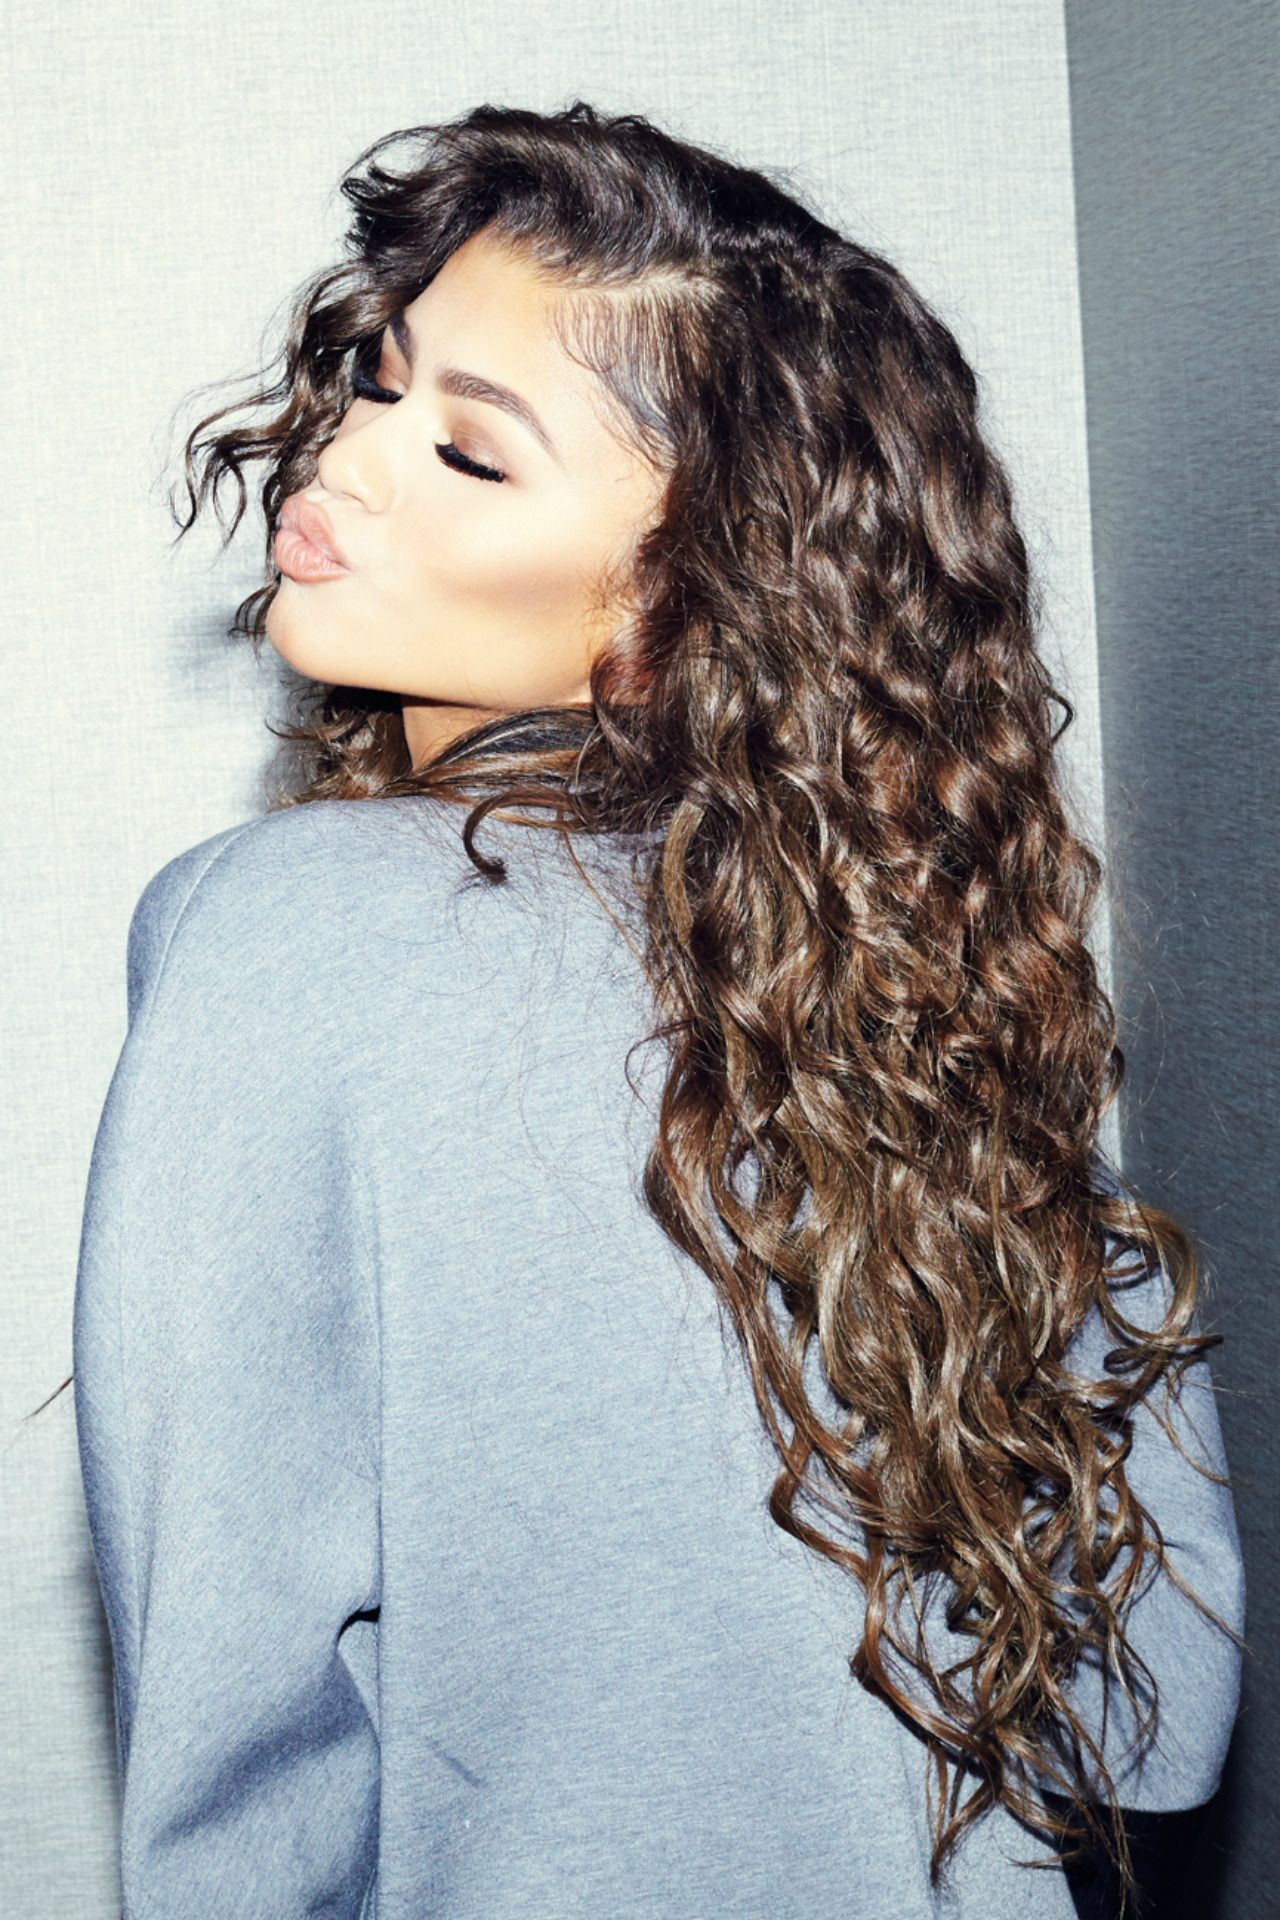 Zendaya Curly Hair L 237 čenie Žena Portr 233 Ty